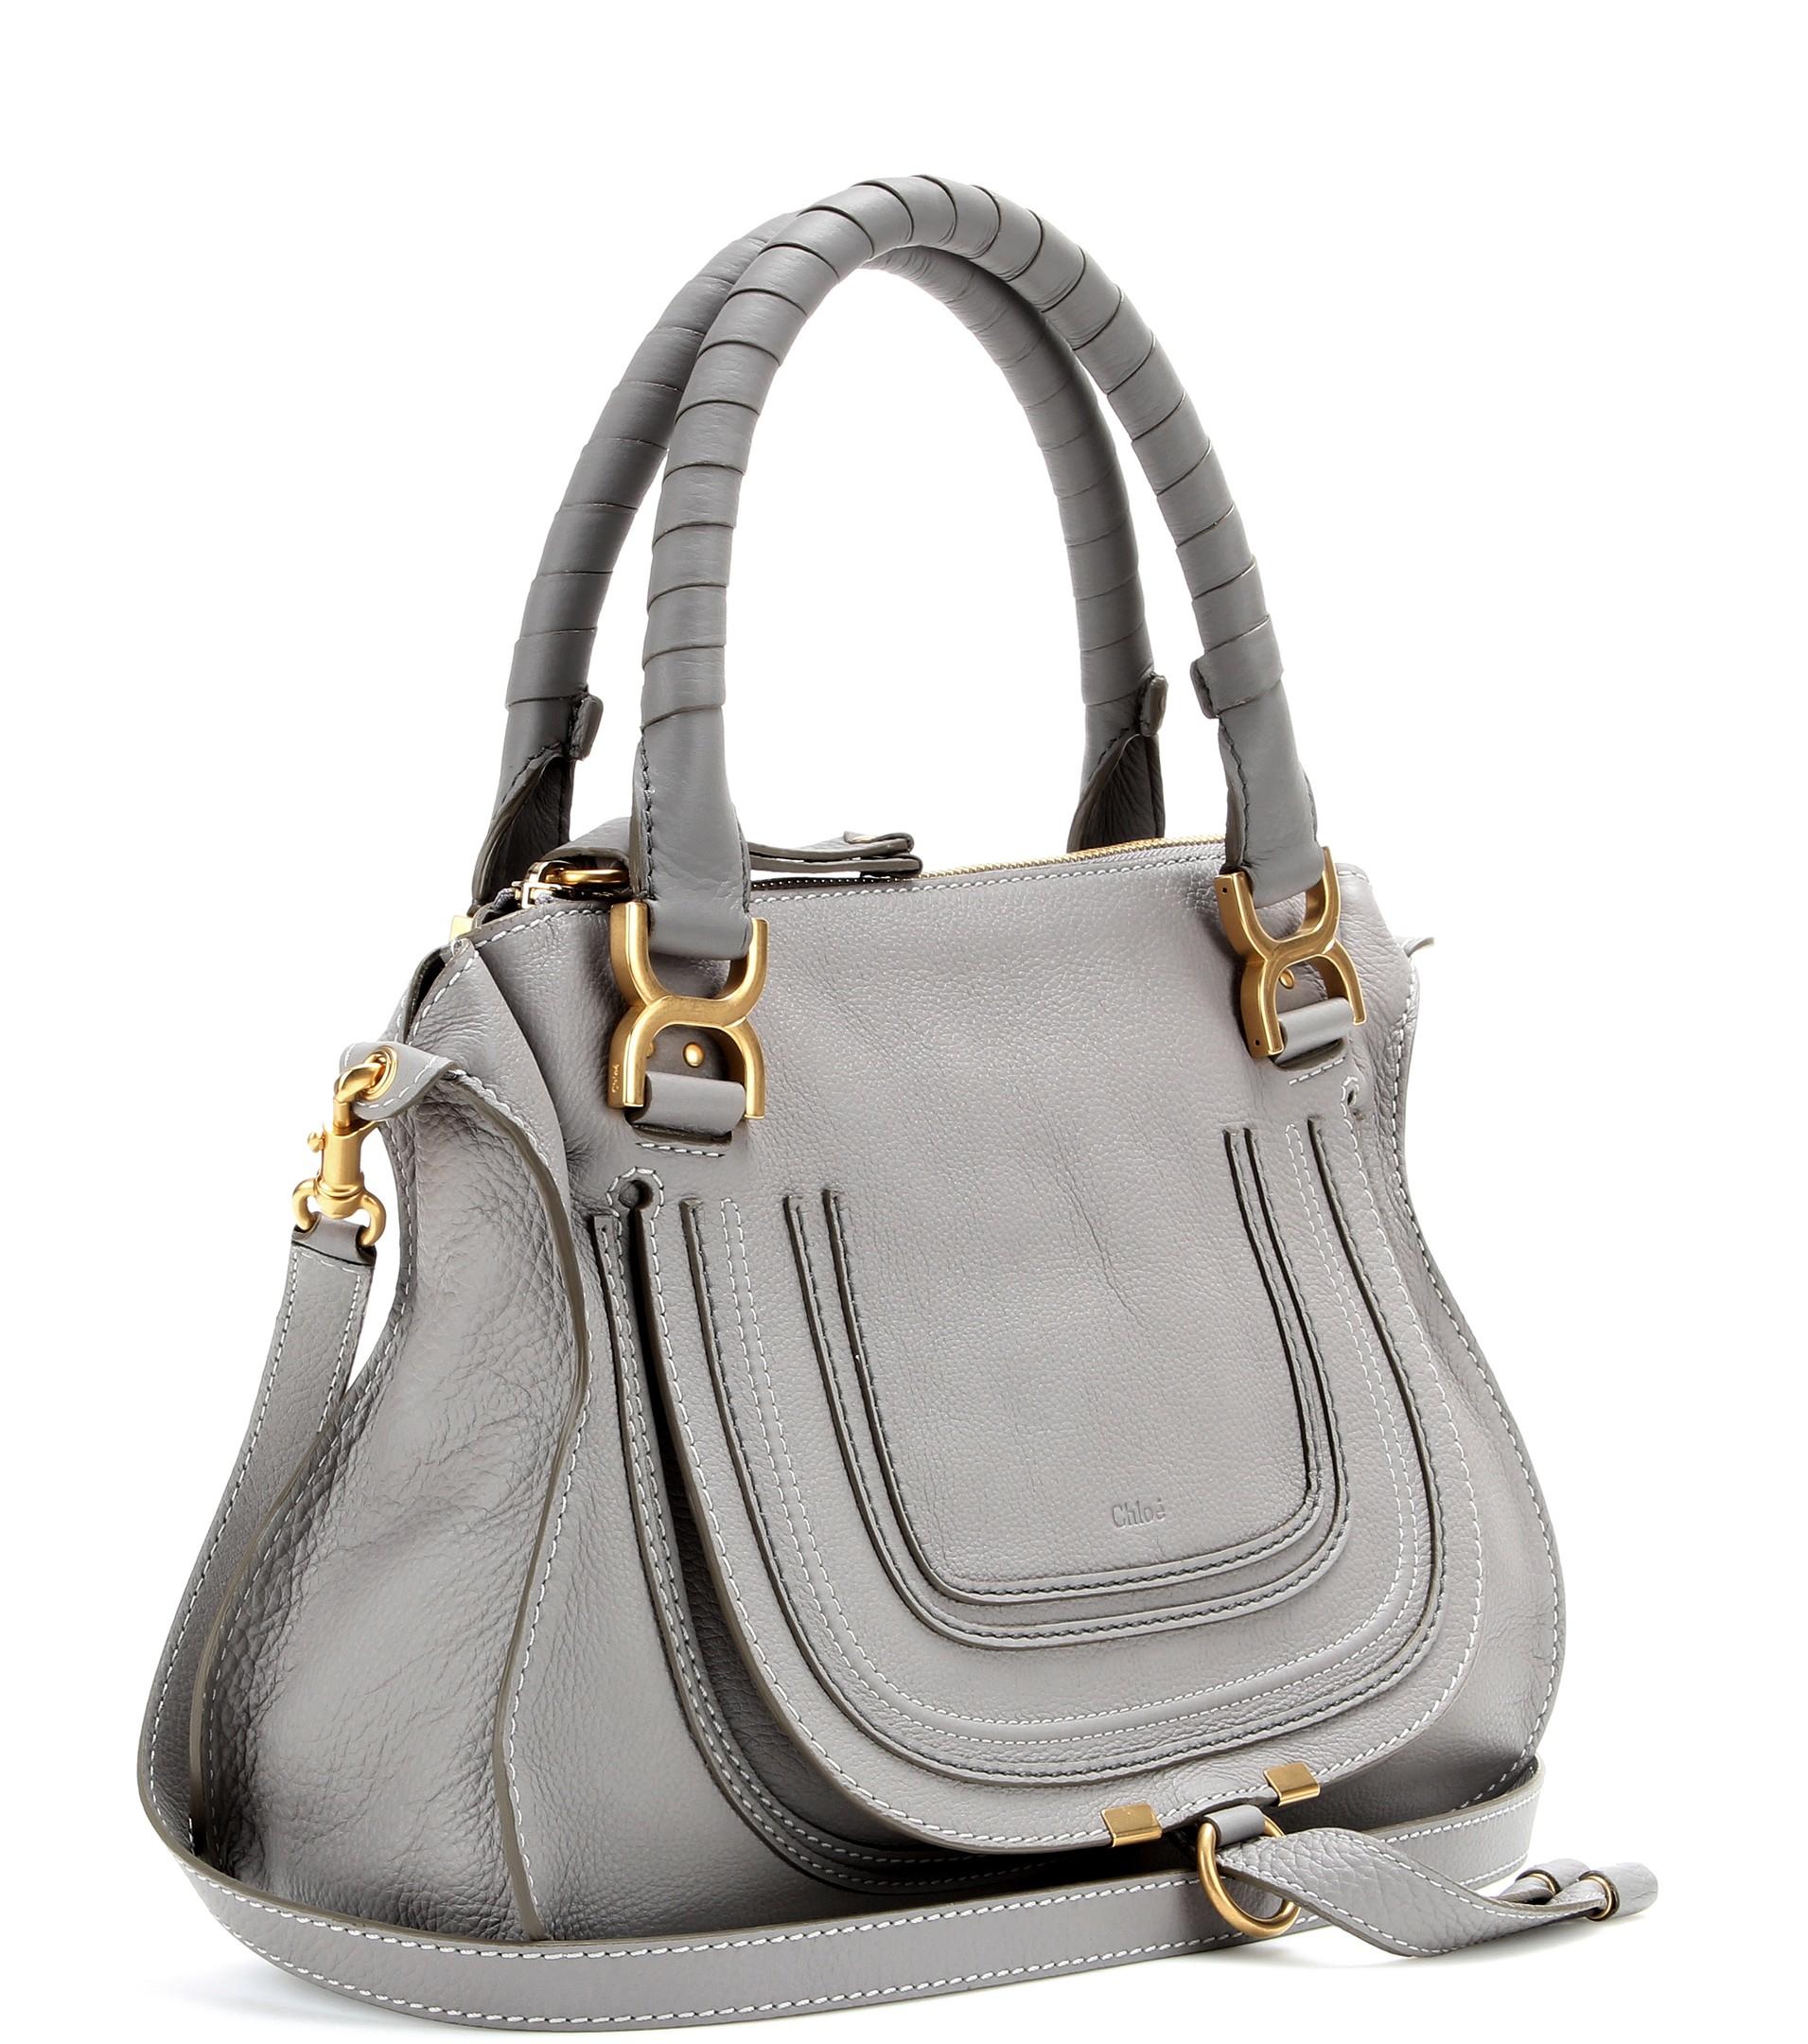 chloe tan leather handbag - chloe medium keri calfskin leather tote, chloe satchel handbag